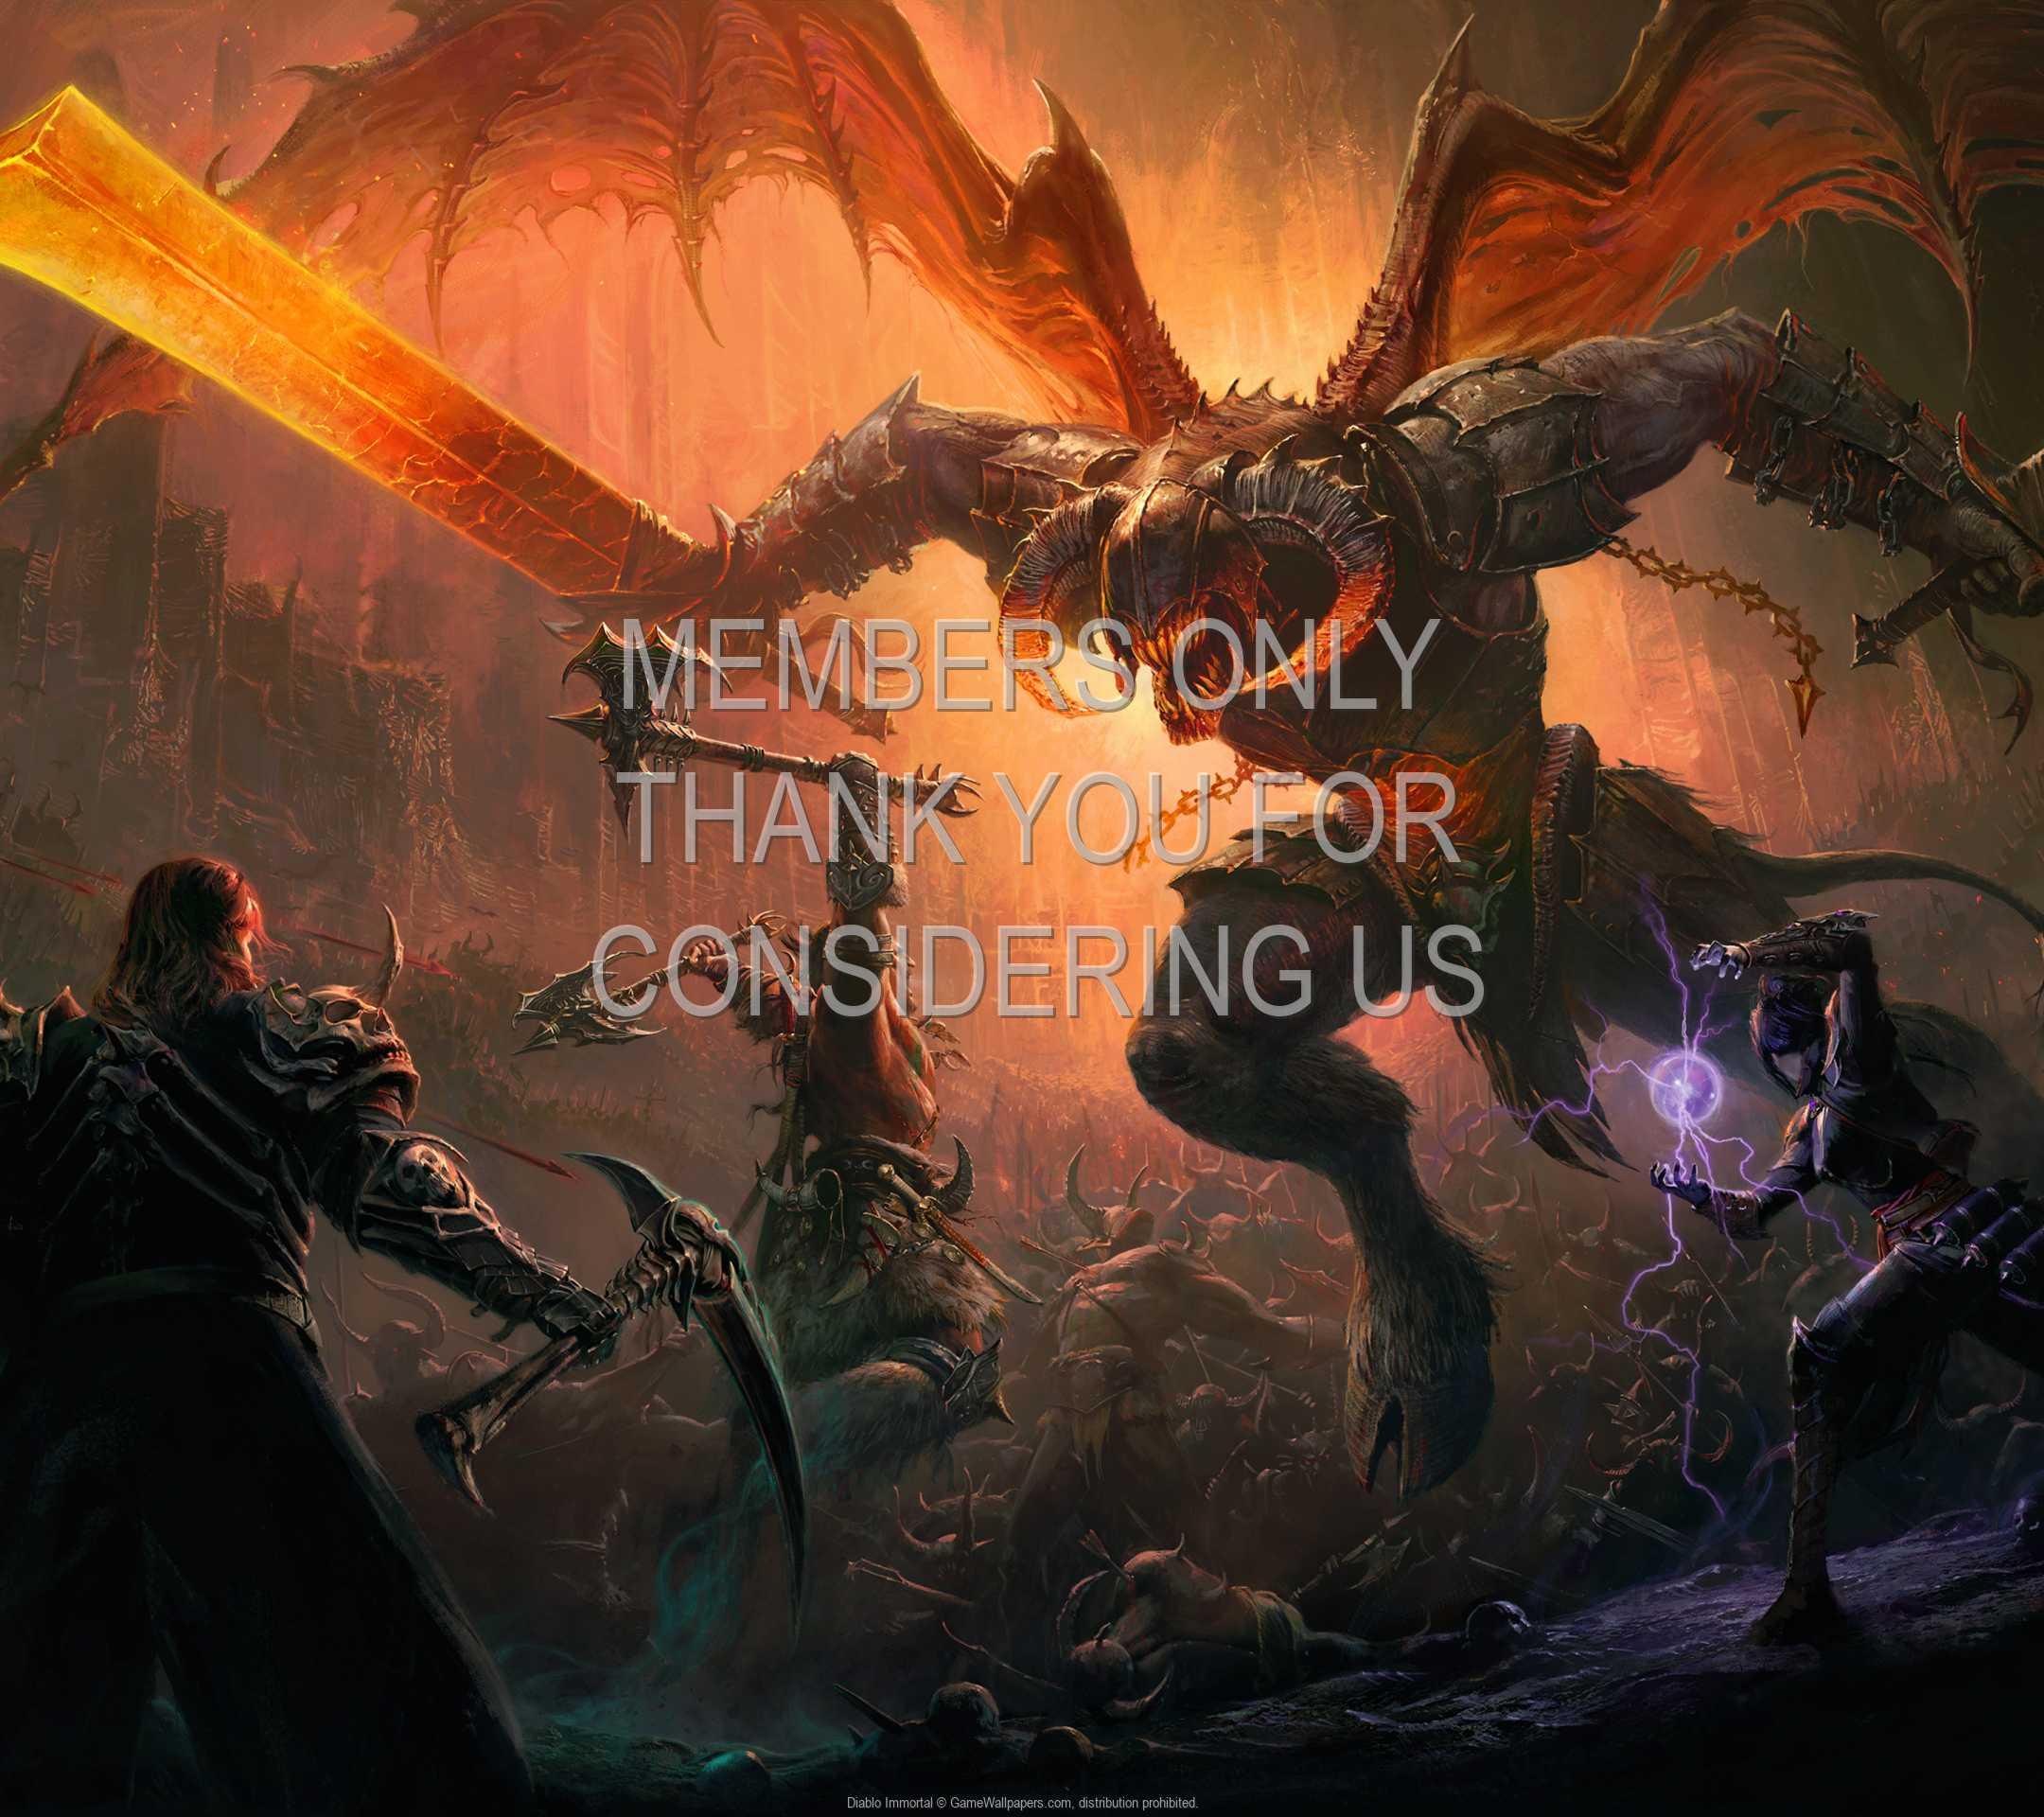 Diablo Immortal 1080p Horizontal Mobile wallpaper or background 07